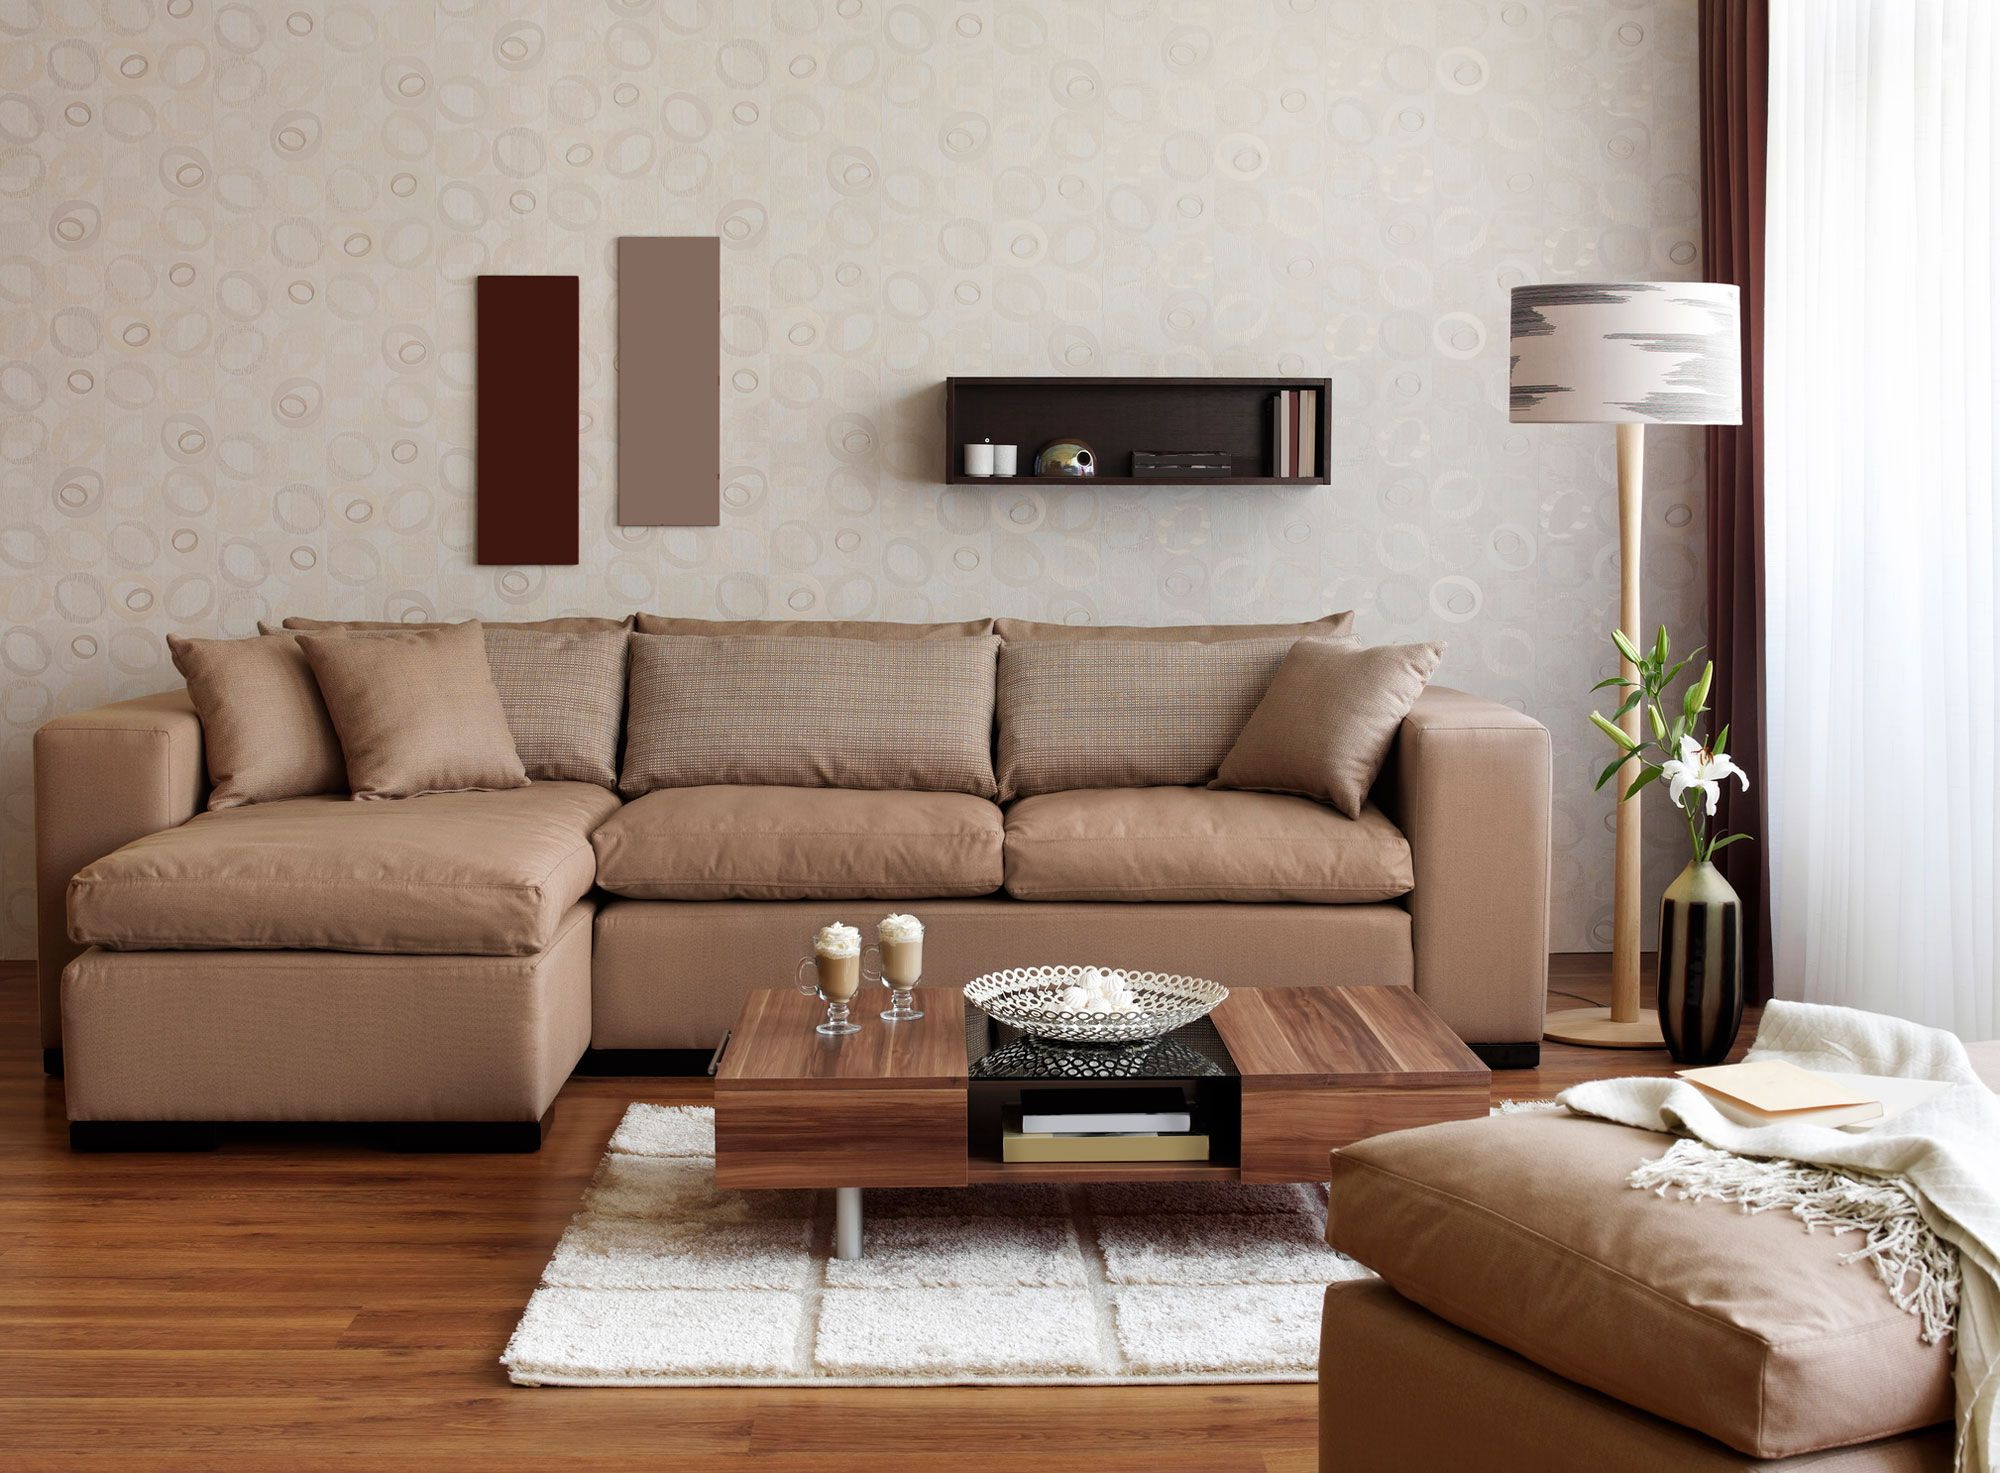 Tipos De Sillones Gdd0 Tipos De sofà S Hogarmania